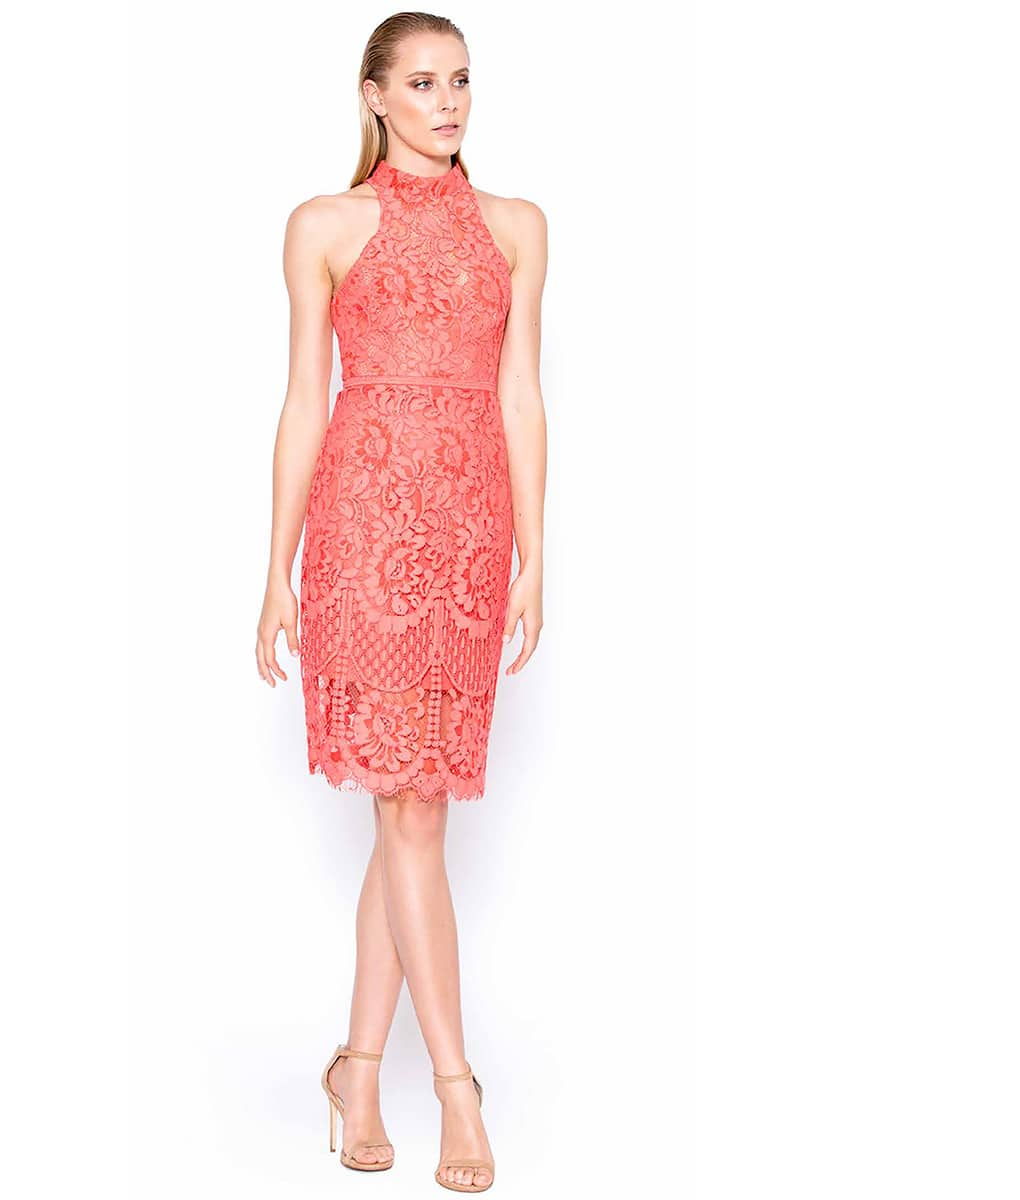 Alila-Coral-Lace-High-Neck-midi-dress-FOR-WEDDING-Lumier-Bariano